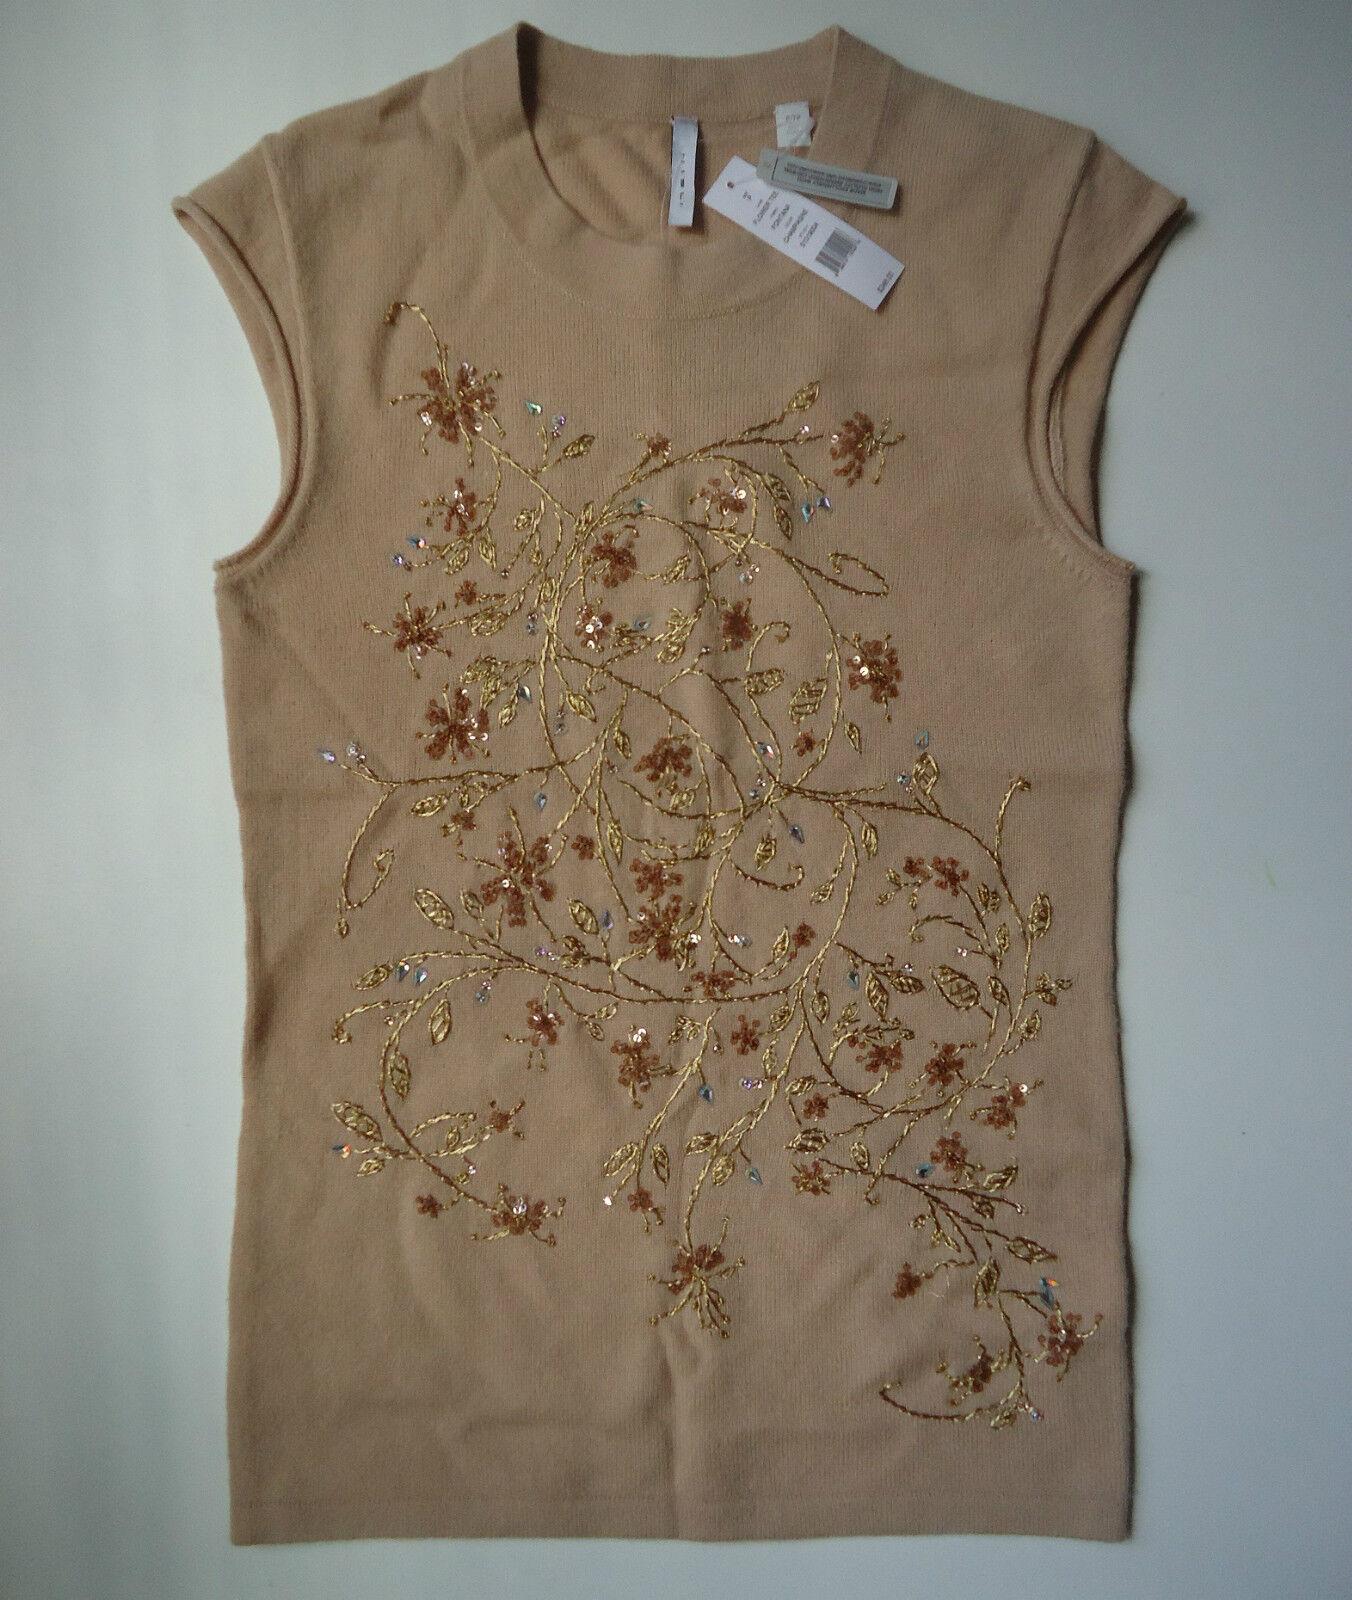 NWT Iisli Crystal Swarovski Embroiderot Cashmere Tee Top Größe P